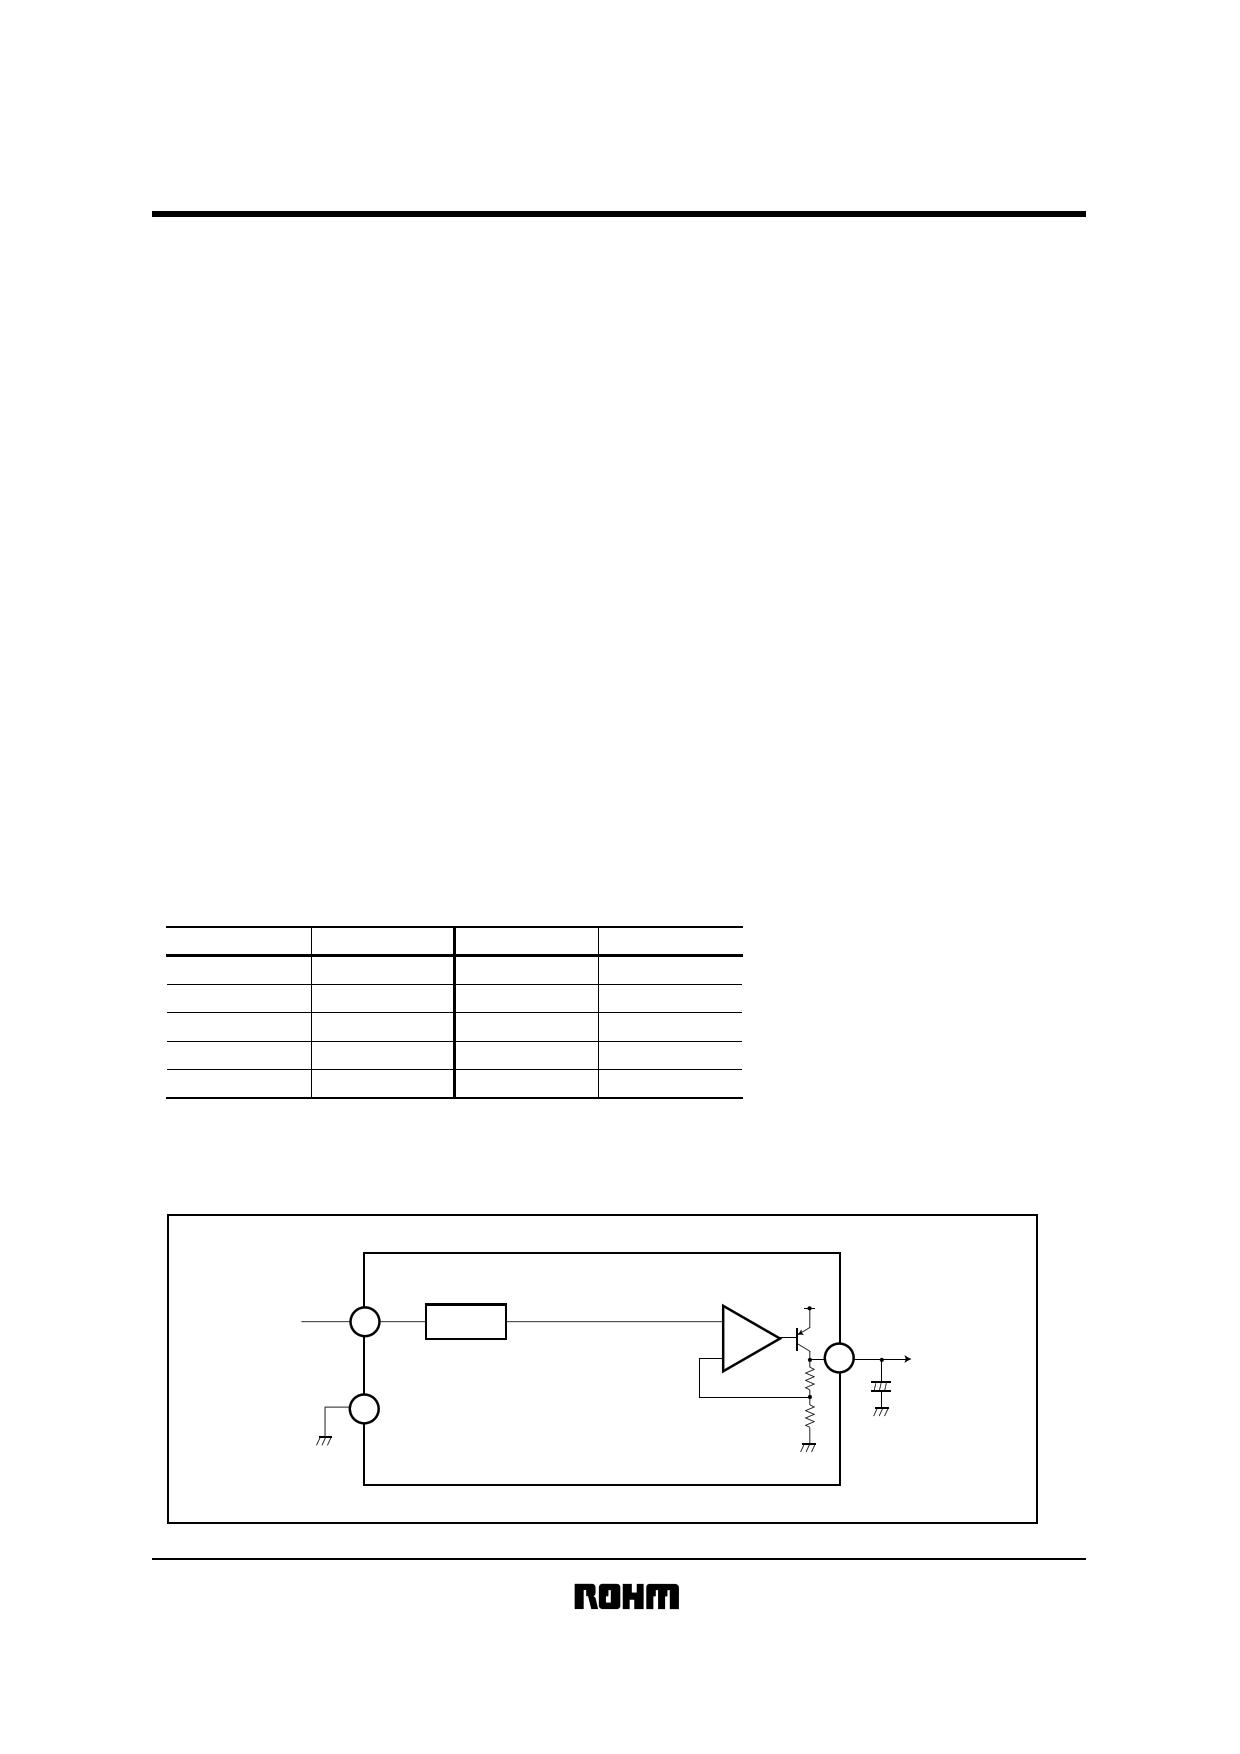 BA06TFP datasheet